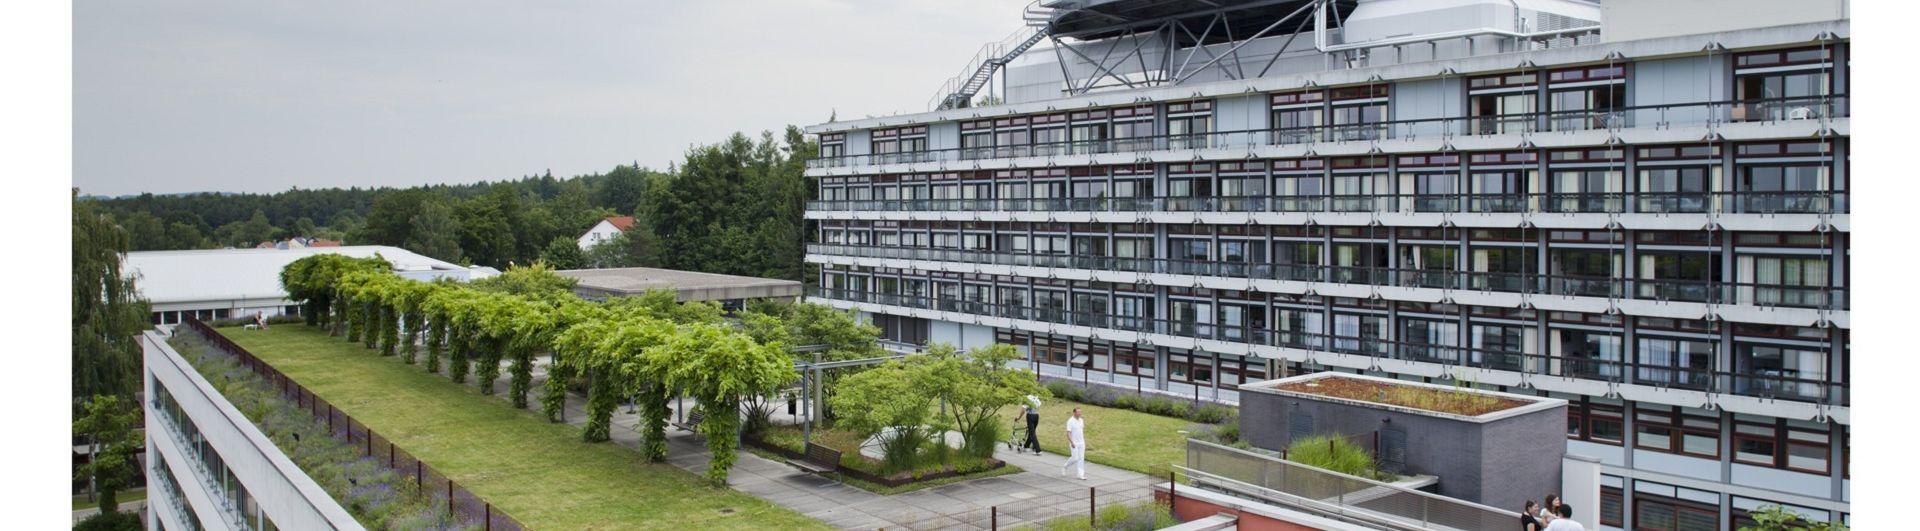 SRH Klinikum Karlsbad-Langensteinbach gGmbH